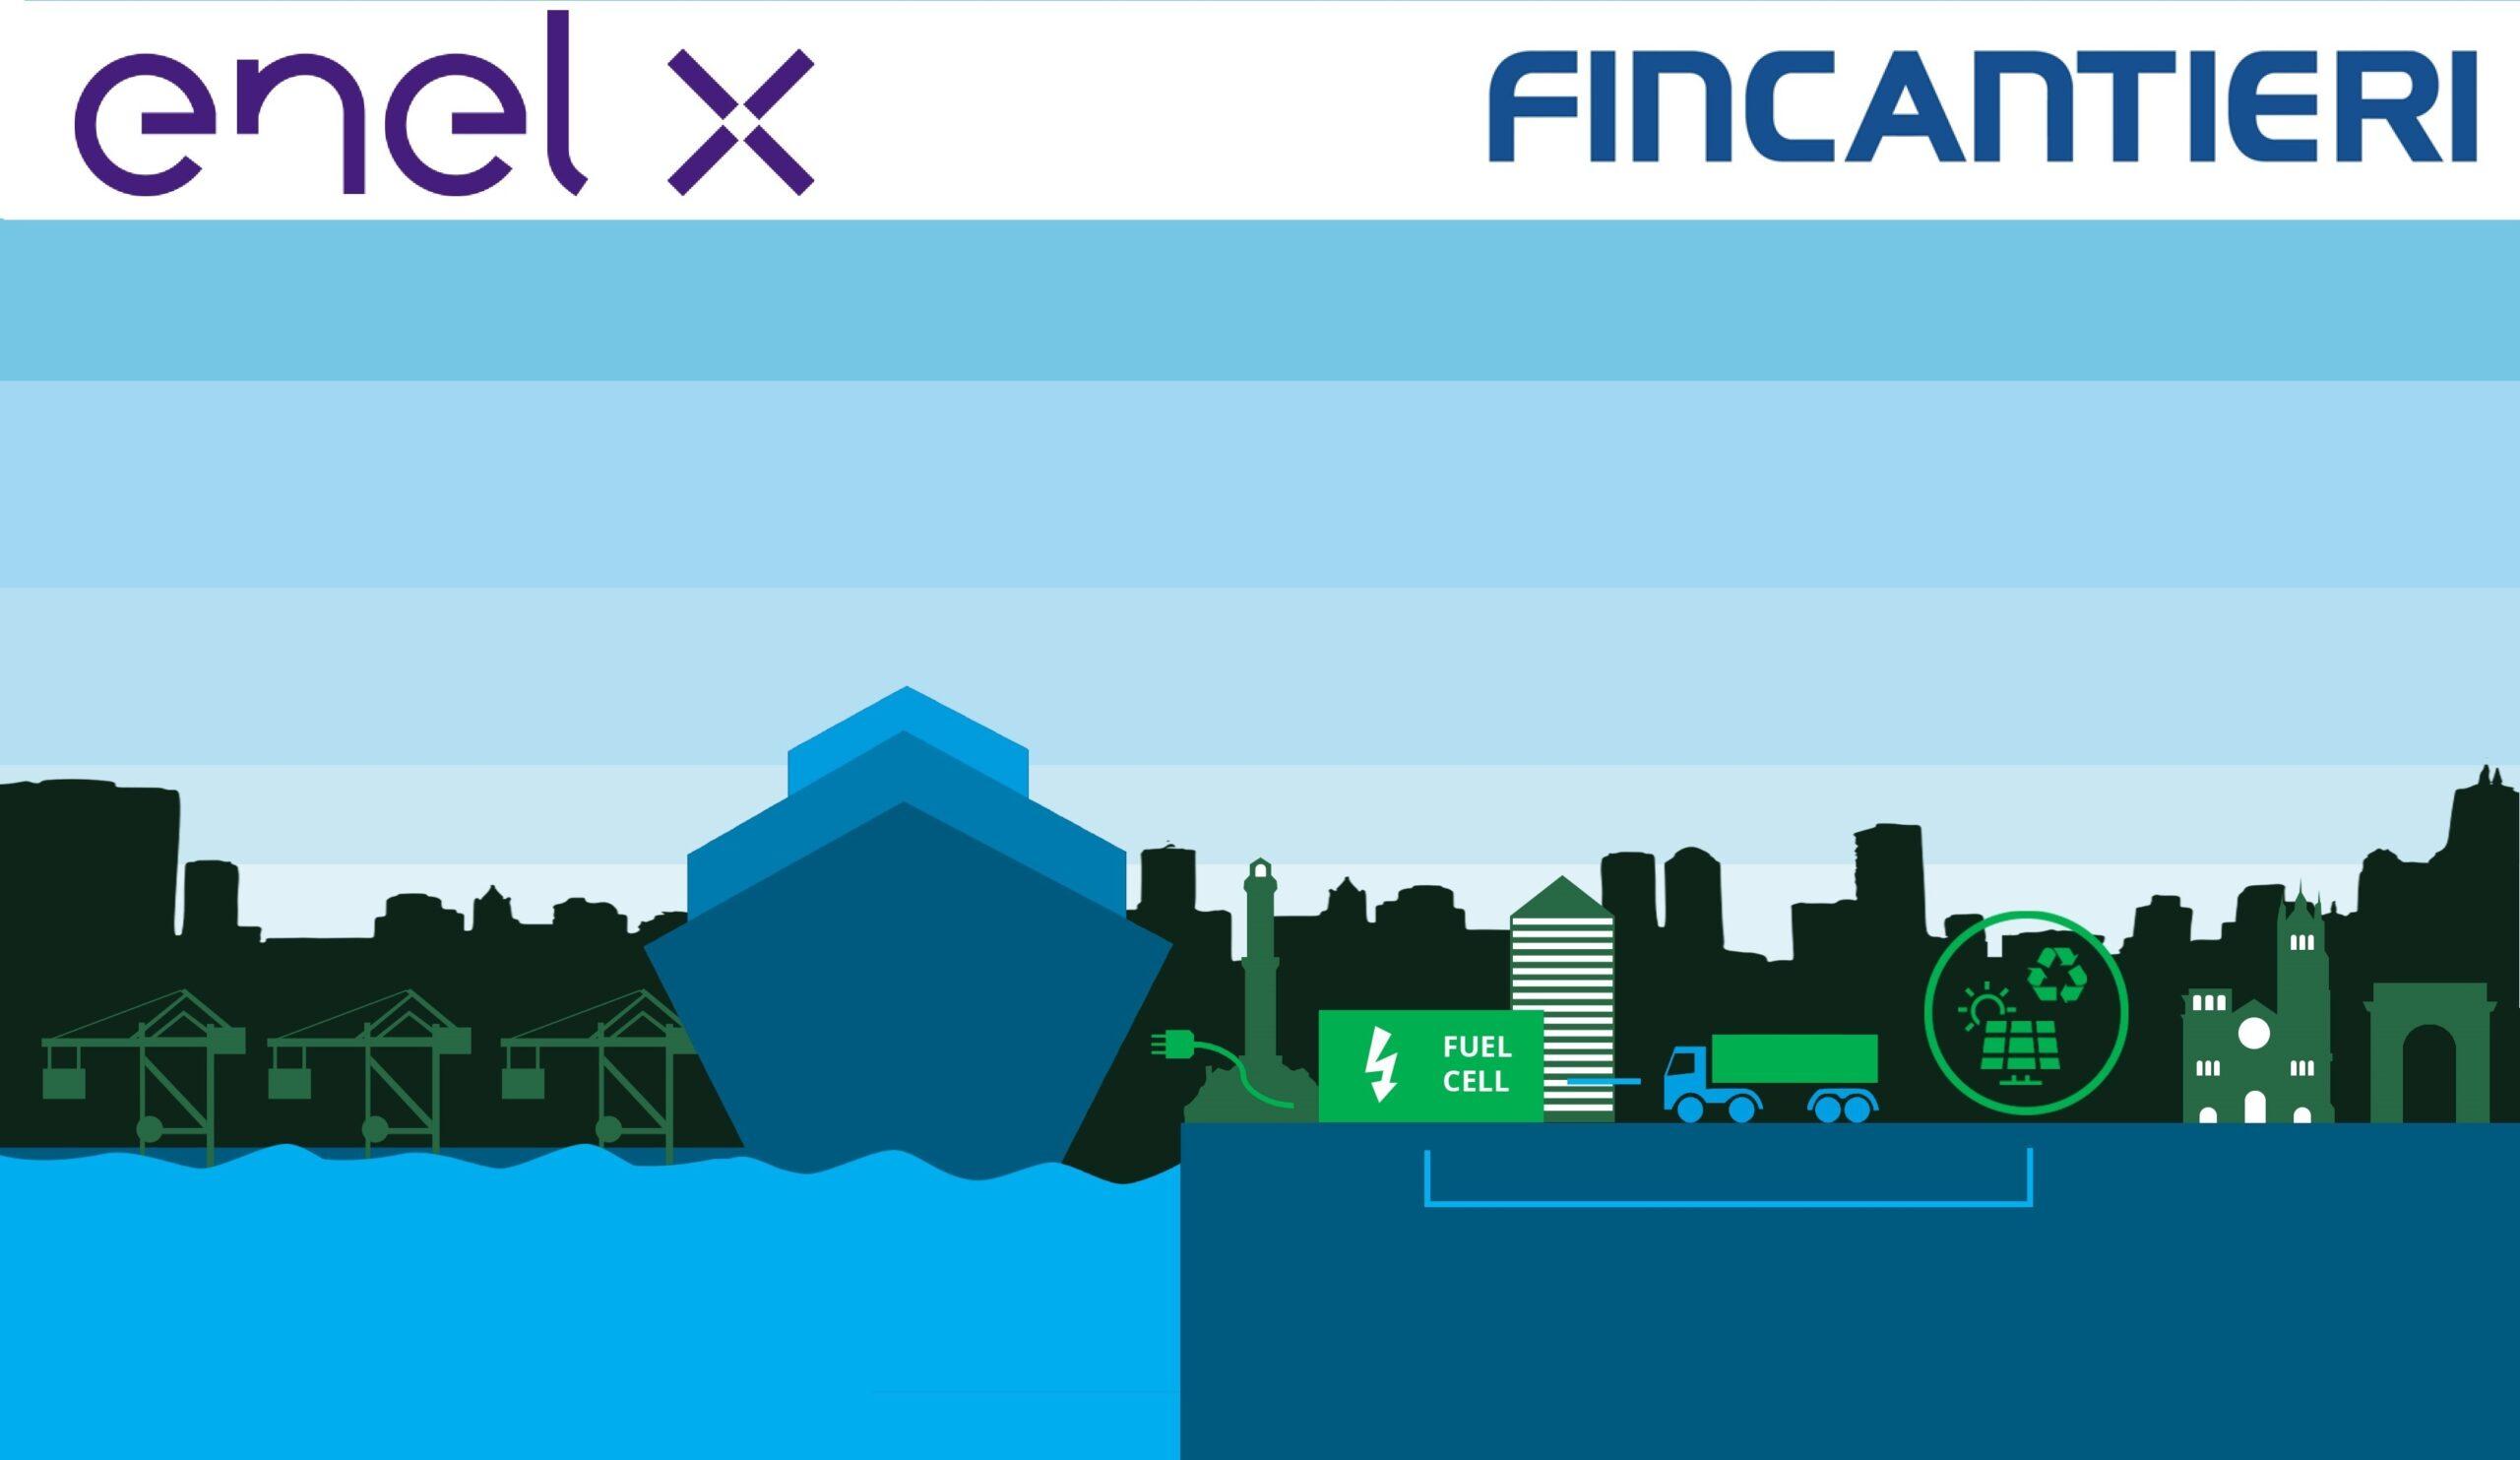 Enel X和Fincantieri如何進行能源轉型